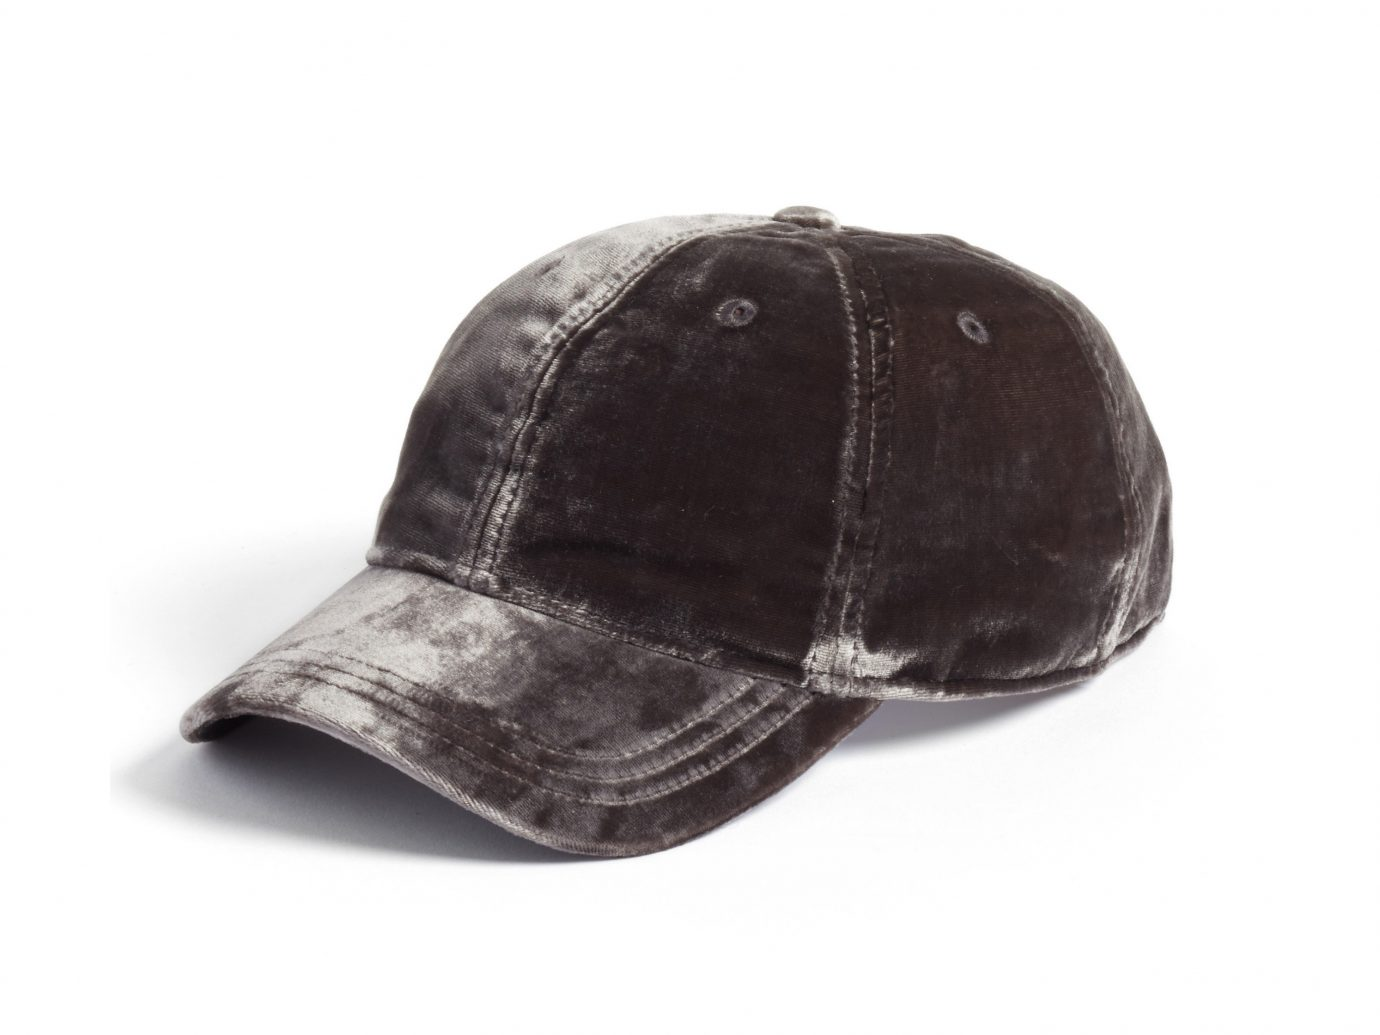 7182e052ed1 Style + Design Travel Shop cap product headgear baseball cap